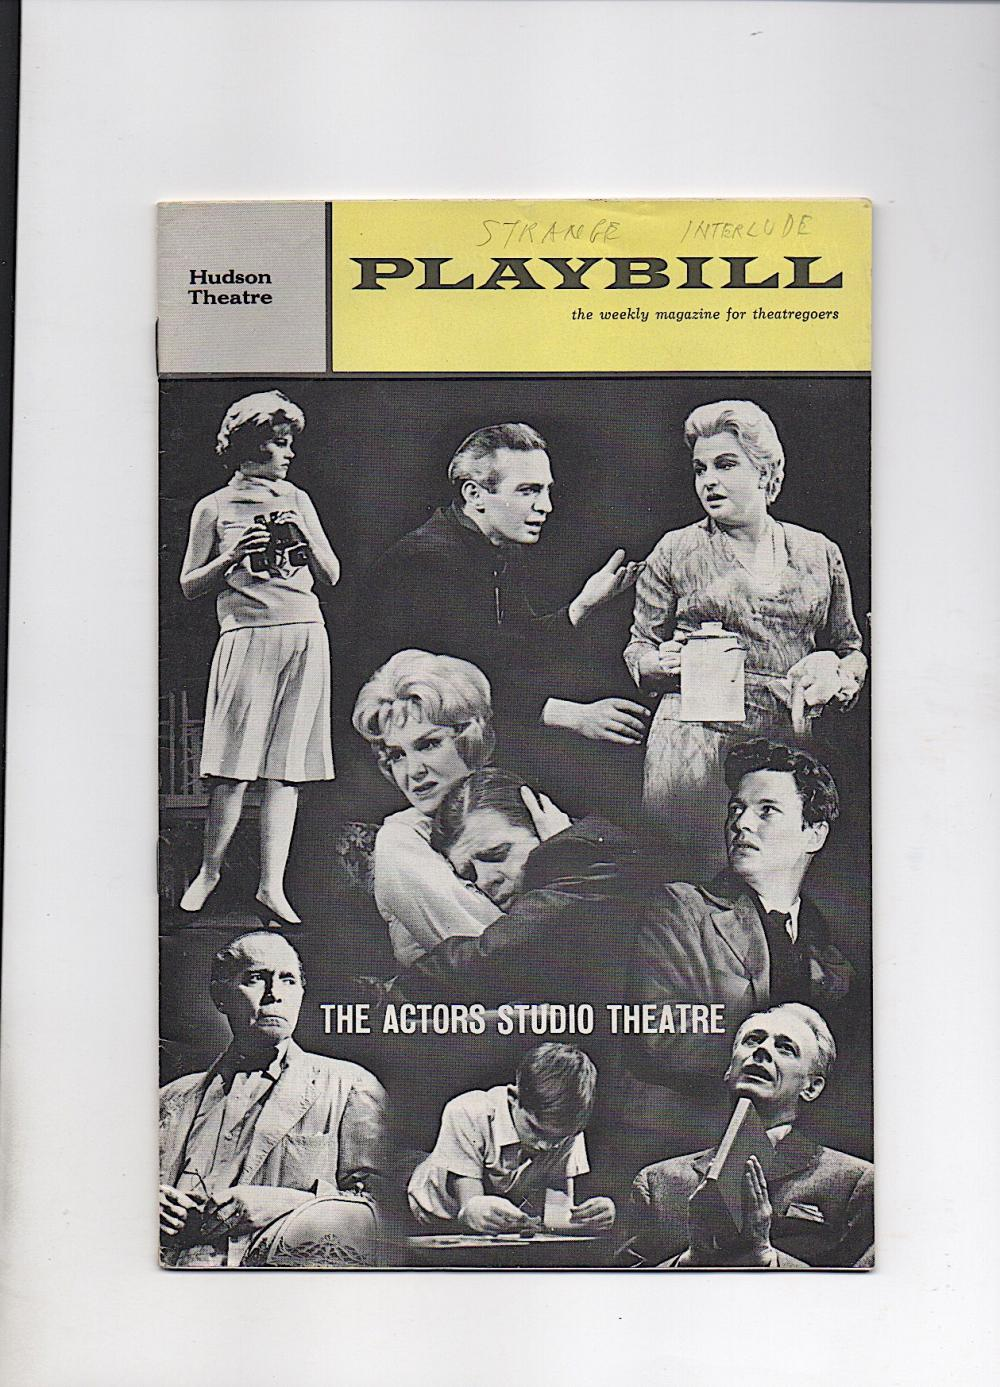 Starring Ben Gazzara, Pat Hingle, Geraldine Page, Franchot Tone